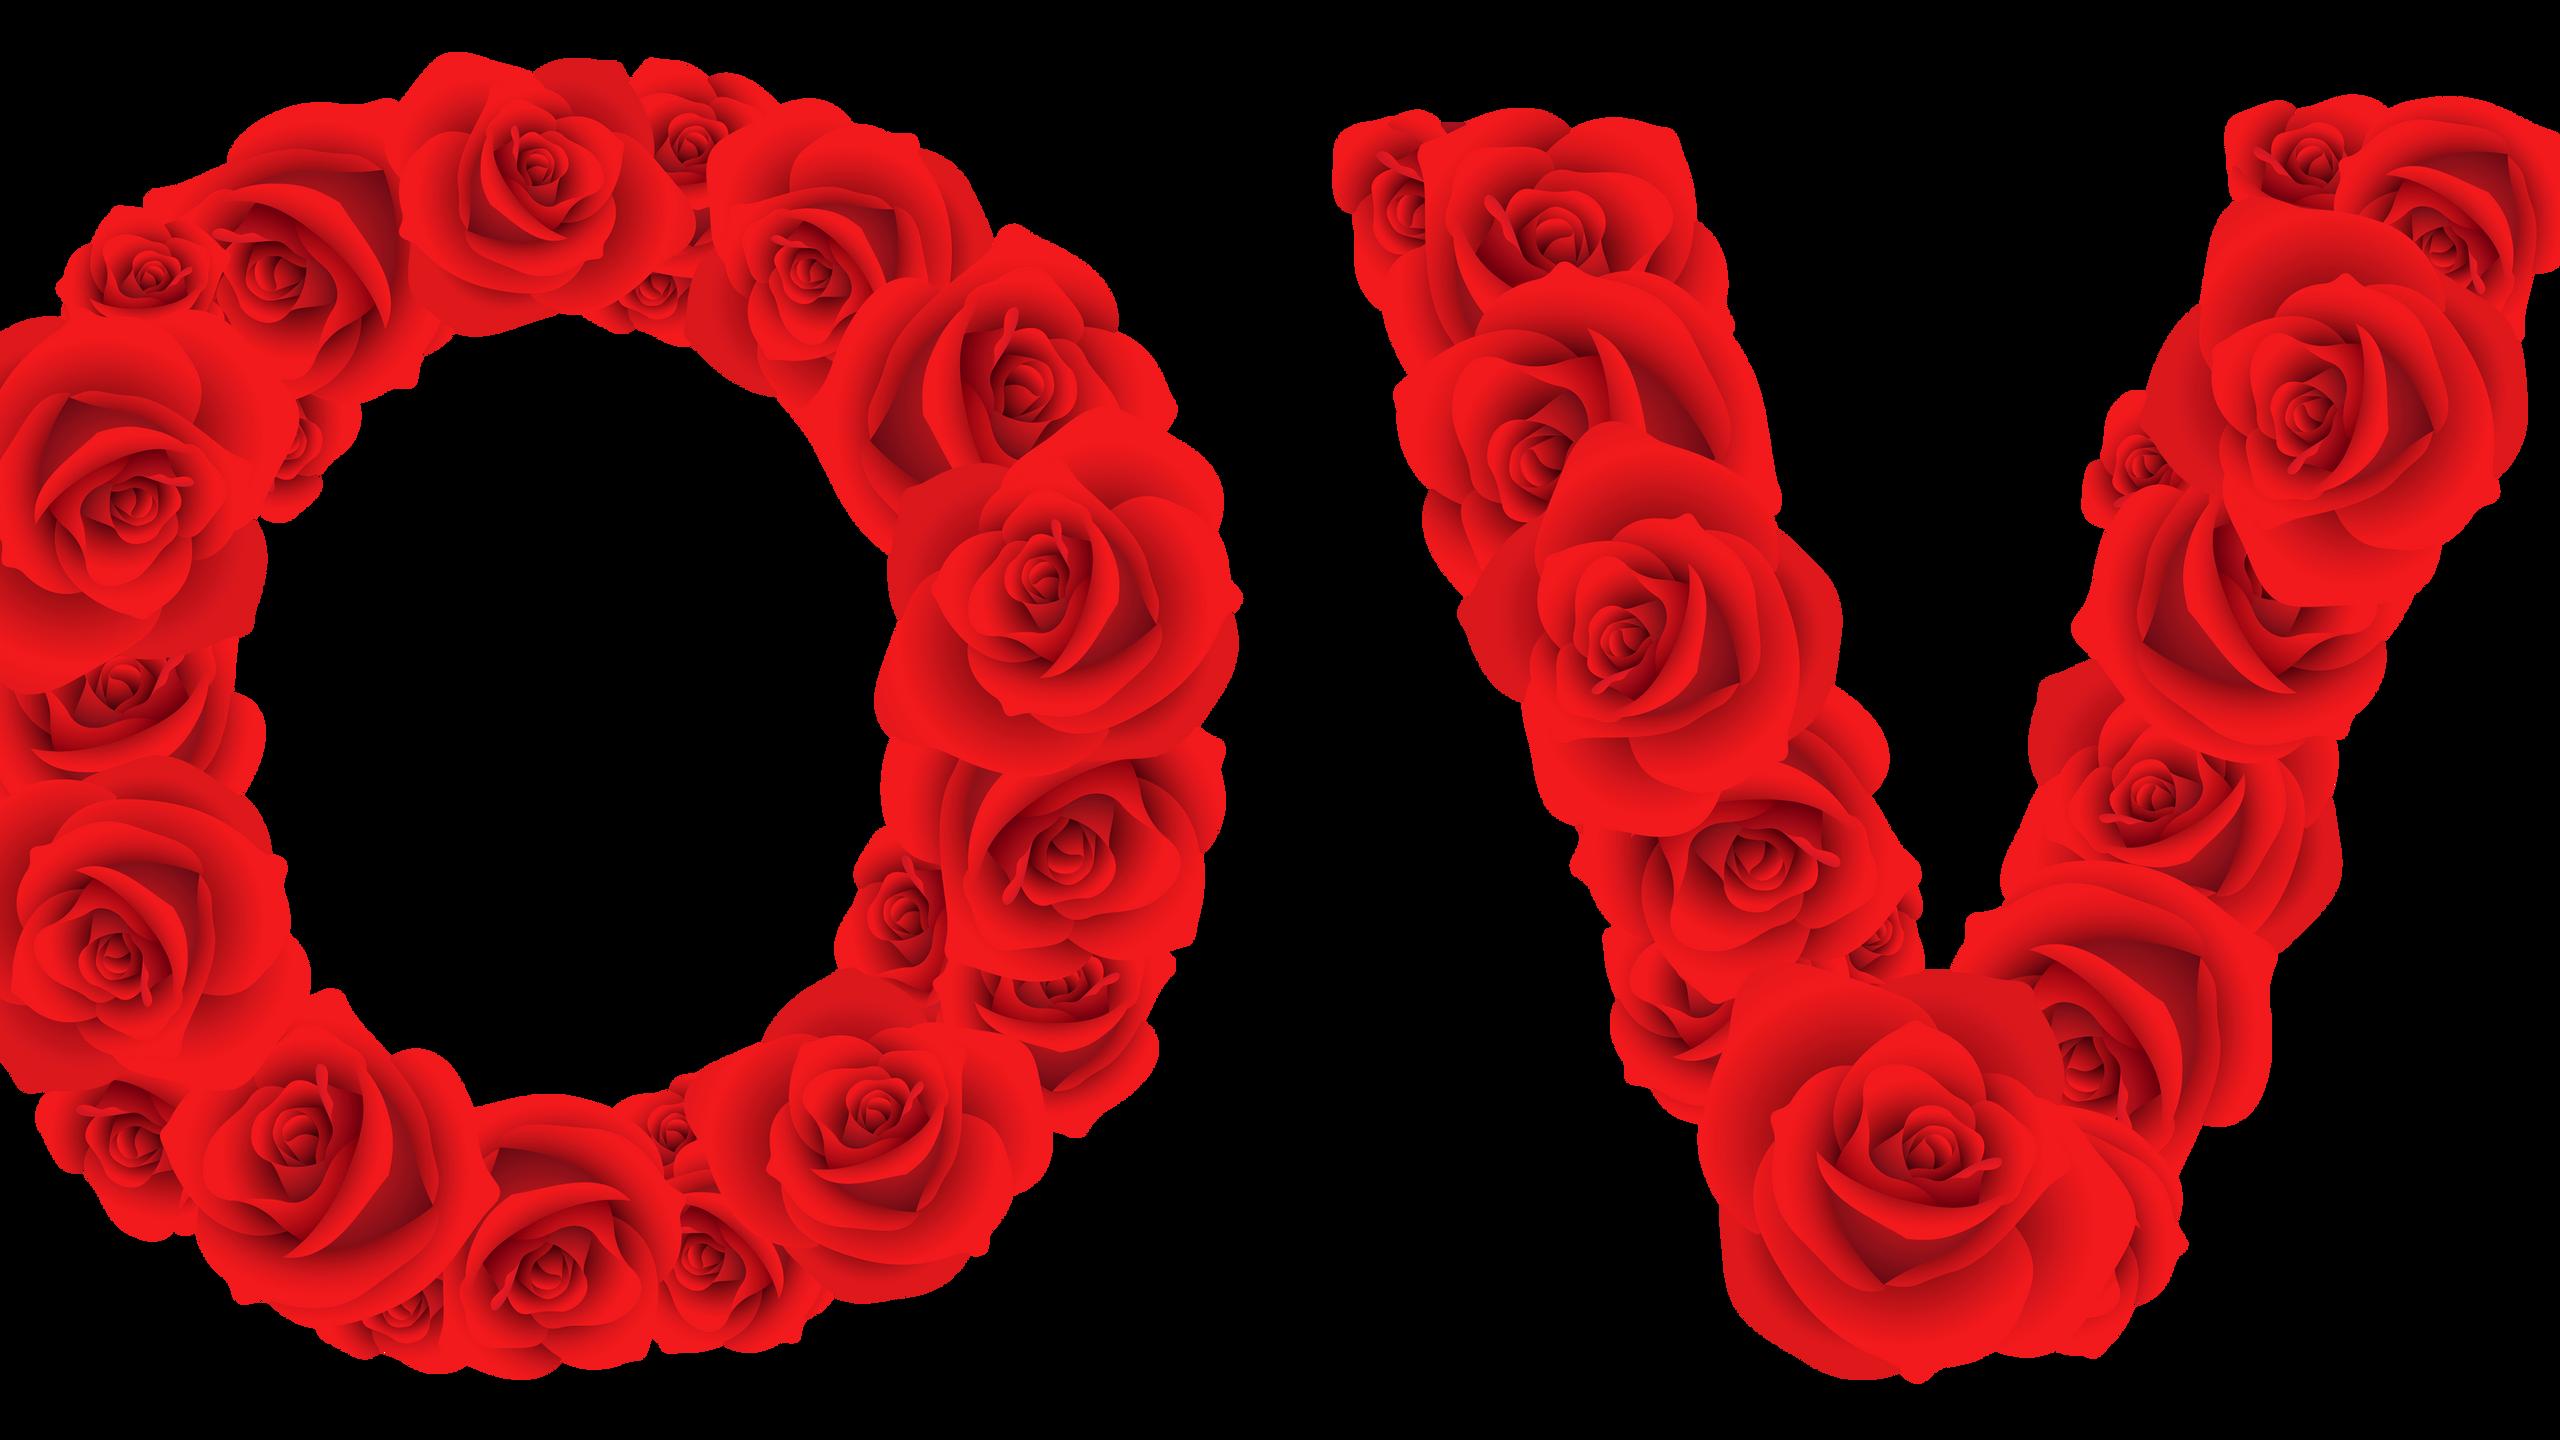 Love_of_Roses_Transparent_PNG_Clip_Art_Image